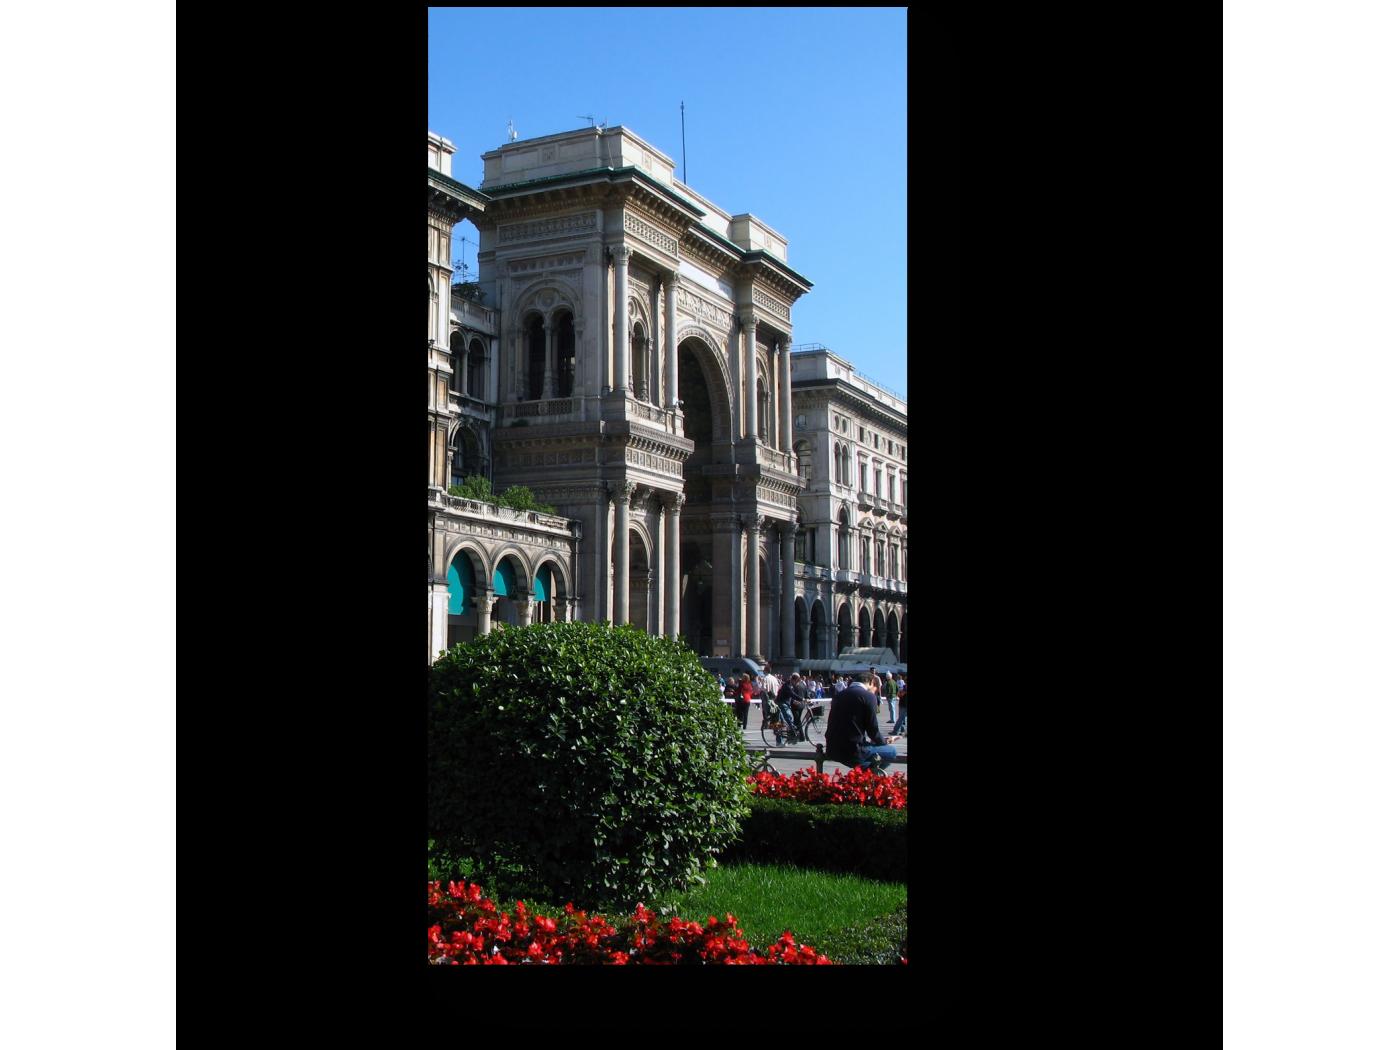 Модульная картина Соборная Площадь, Милан (20x40) фото